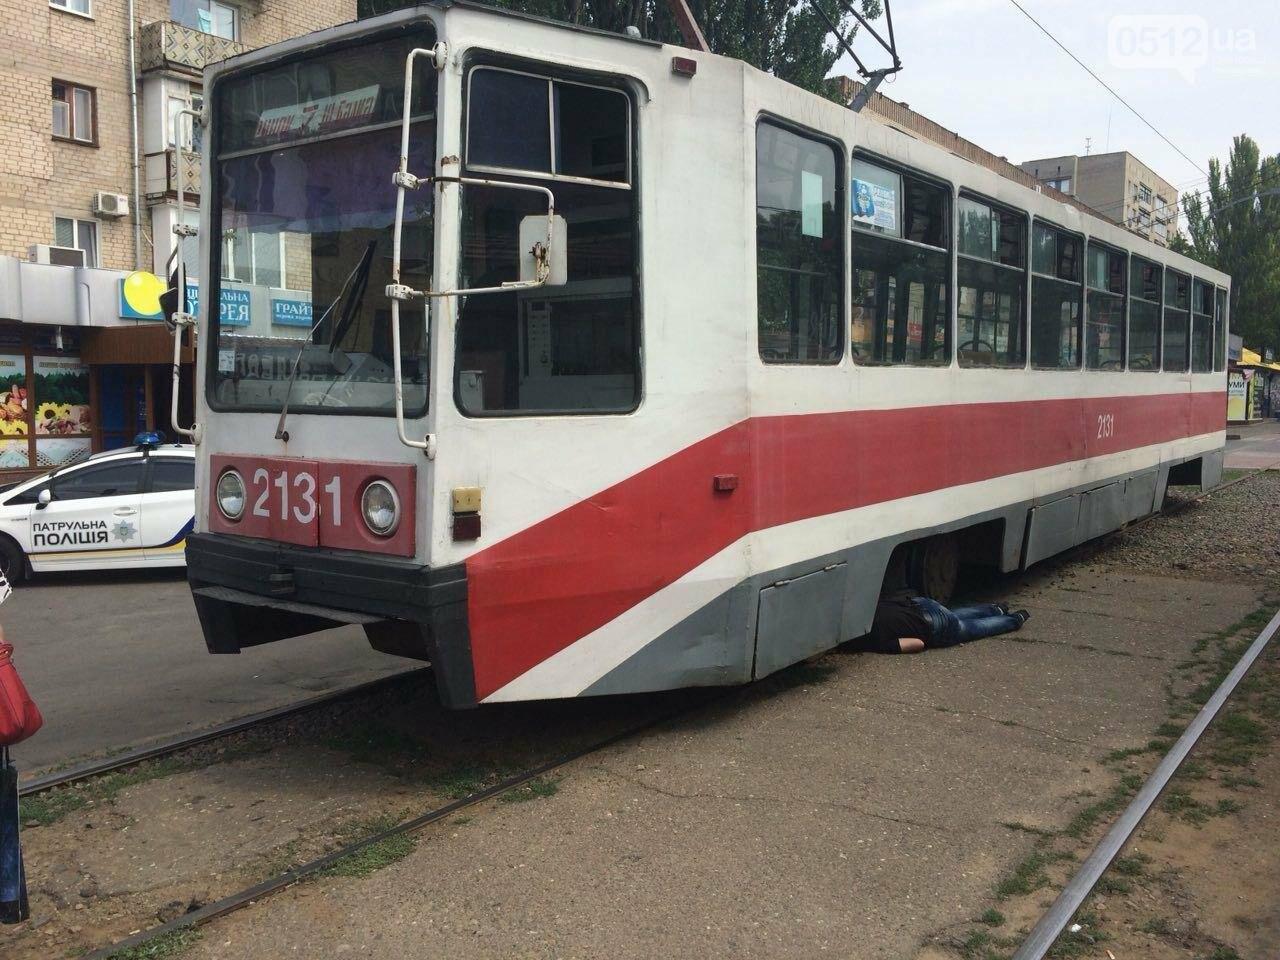 В Николаеве трамвай переехал мужчину, - ФОТО, ВИДЕО 18+, фото-6